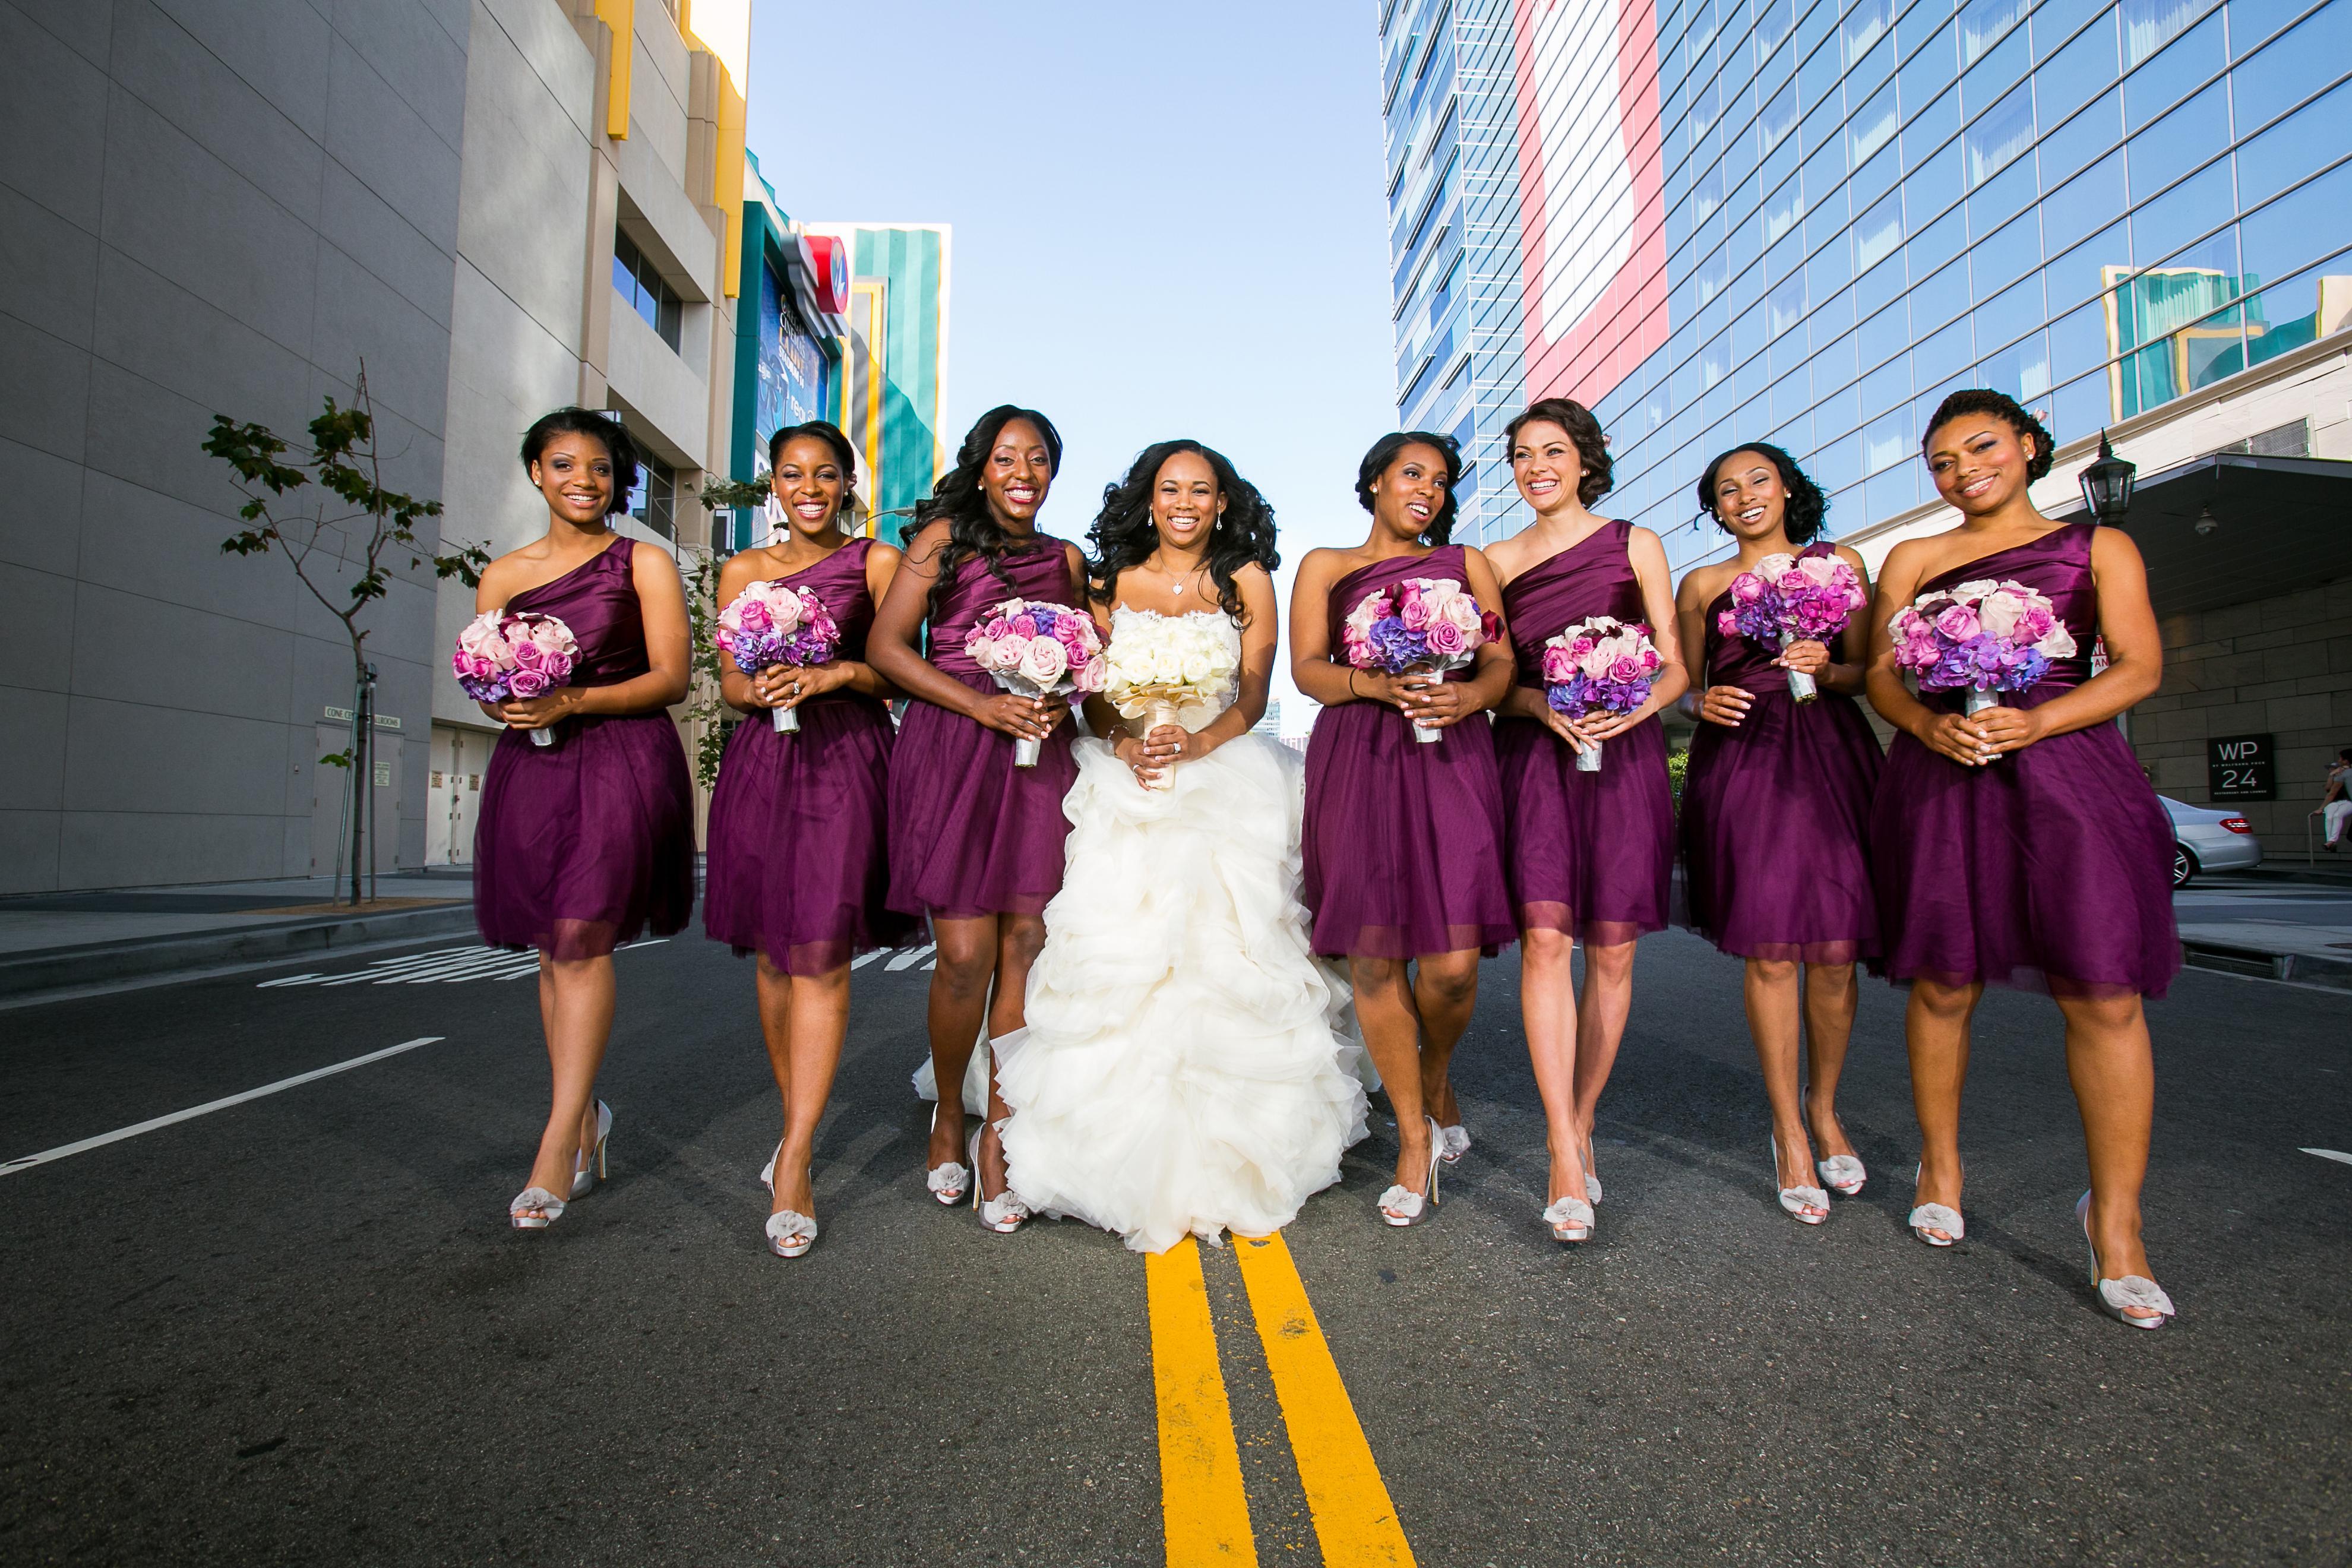 Short bridesmaid dresses ideas for spring summer weddings matching one shoulder purple short bridesmaid dresses for brandon mebane amena jefferson ombrellifo Gallery